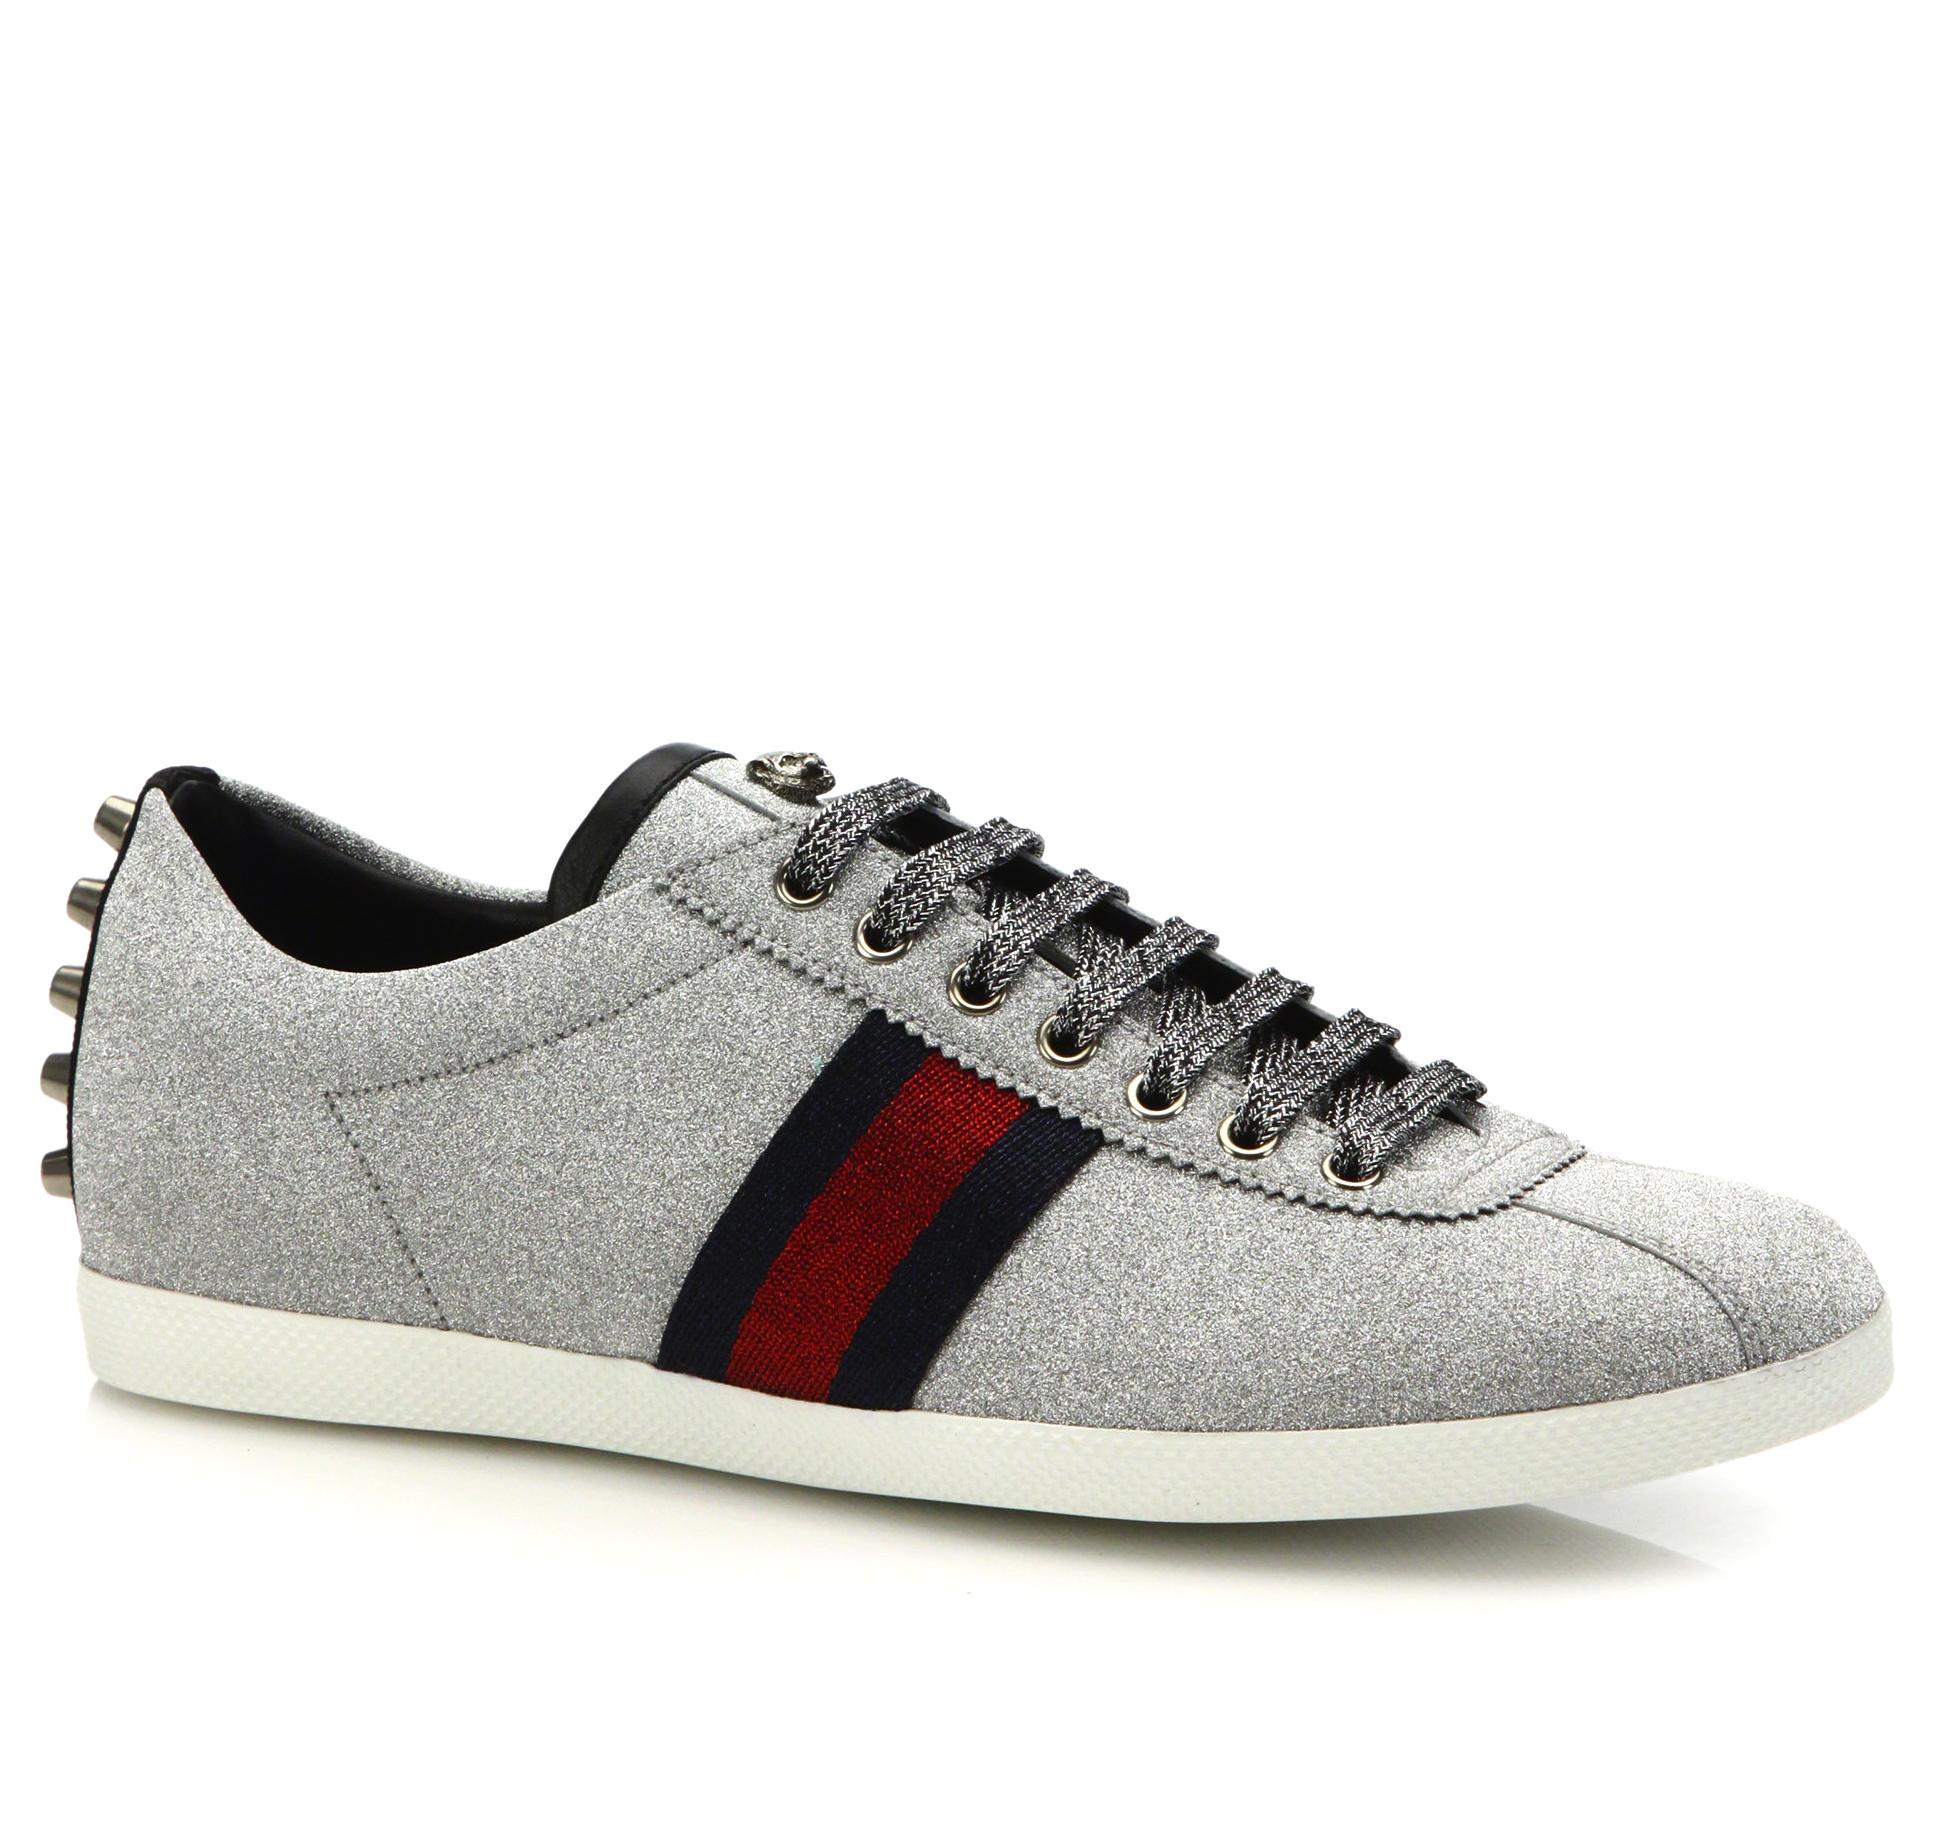 Gucci Silver Sparkle Sneaker Trainers